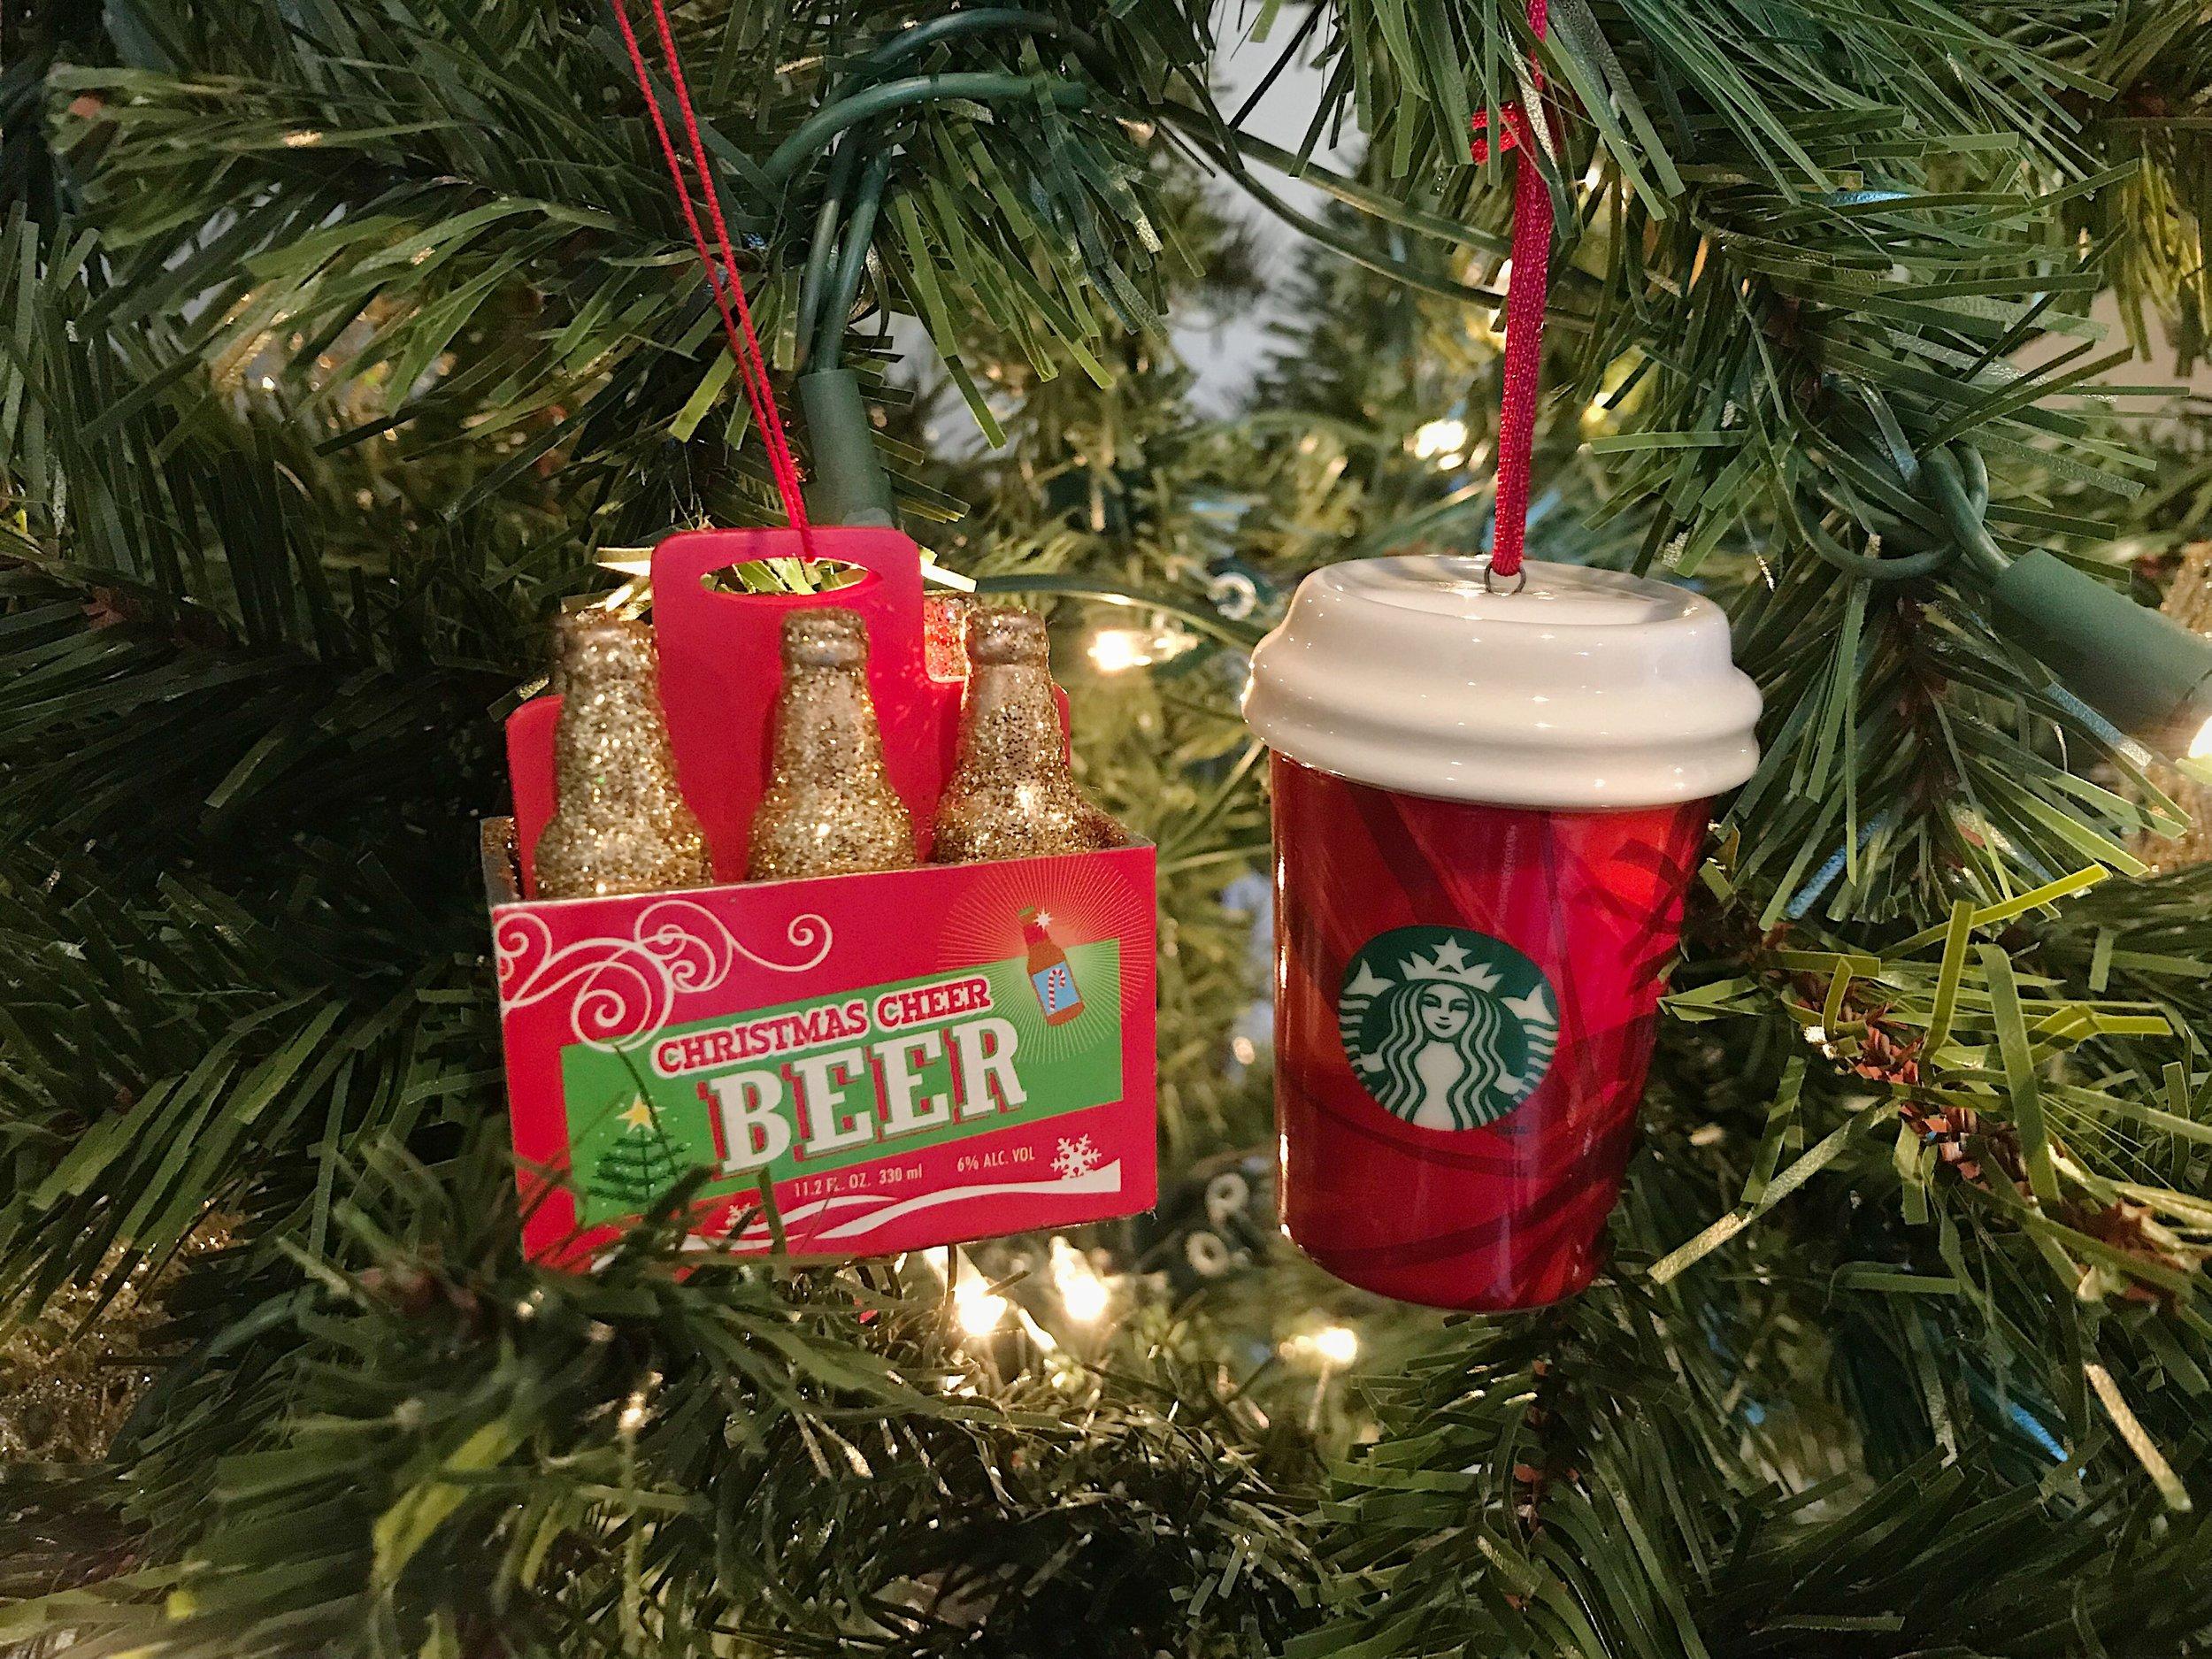 beer and coffee ornaments.JPG